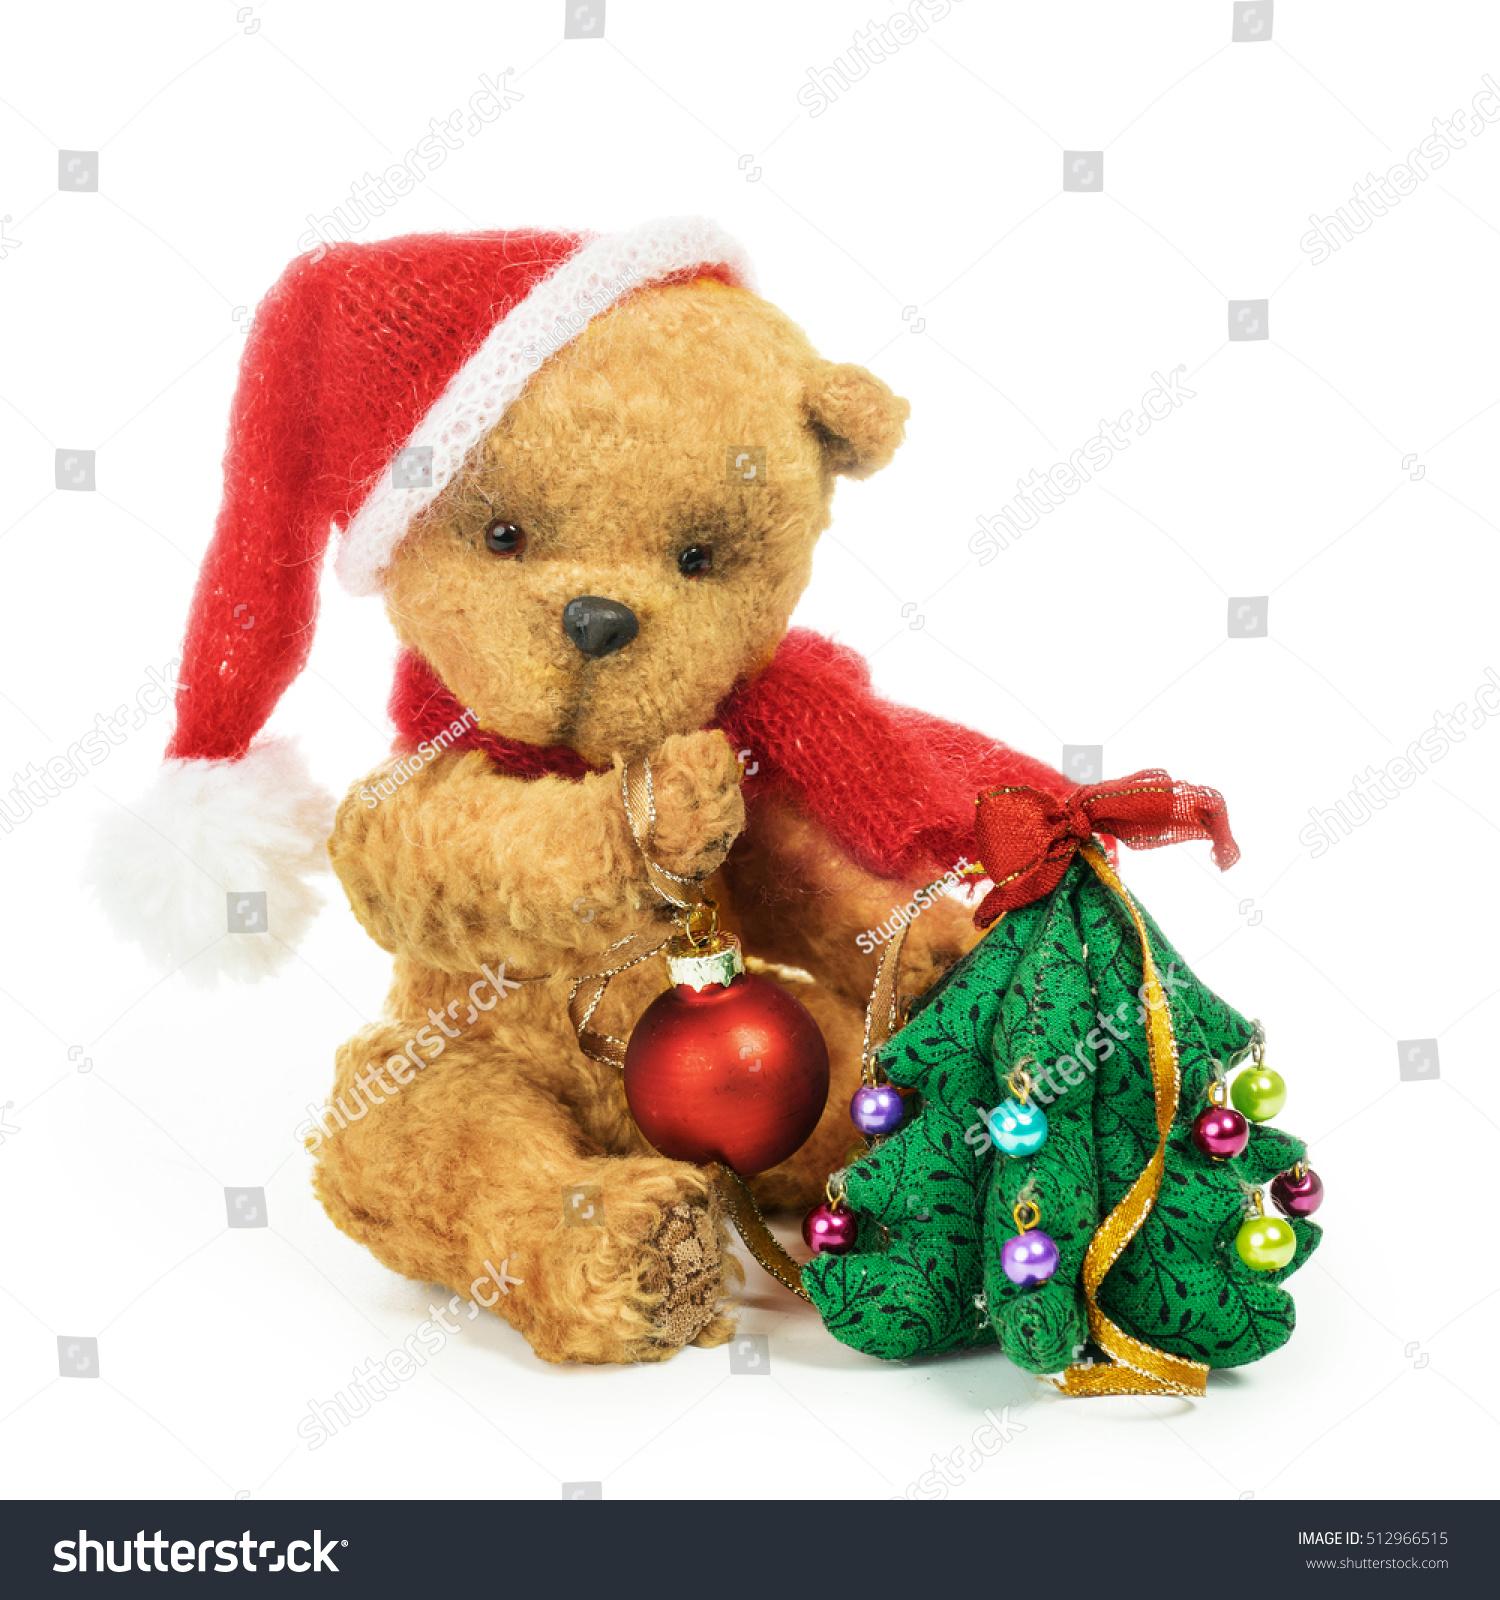 Cute Classic Teddy Bear Christmas Tree Stock Photo 512966515 ...